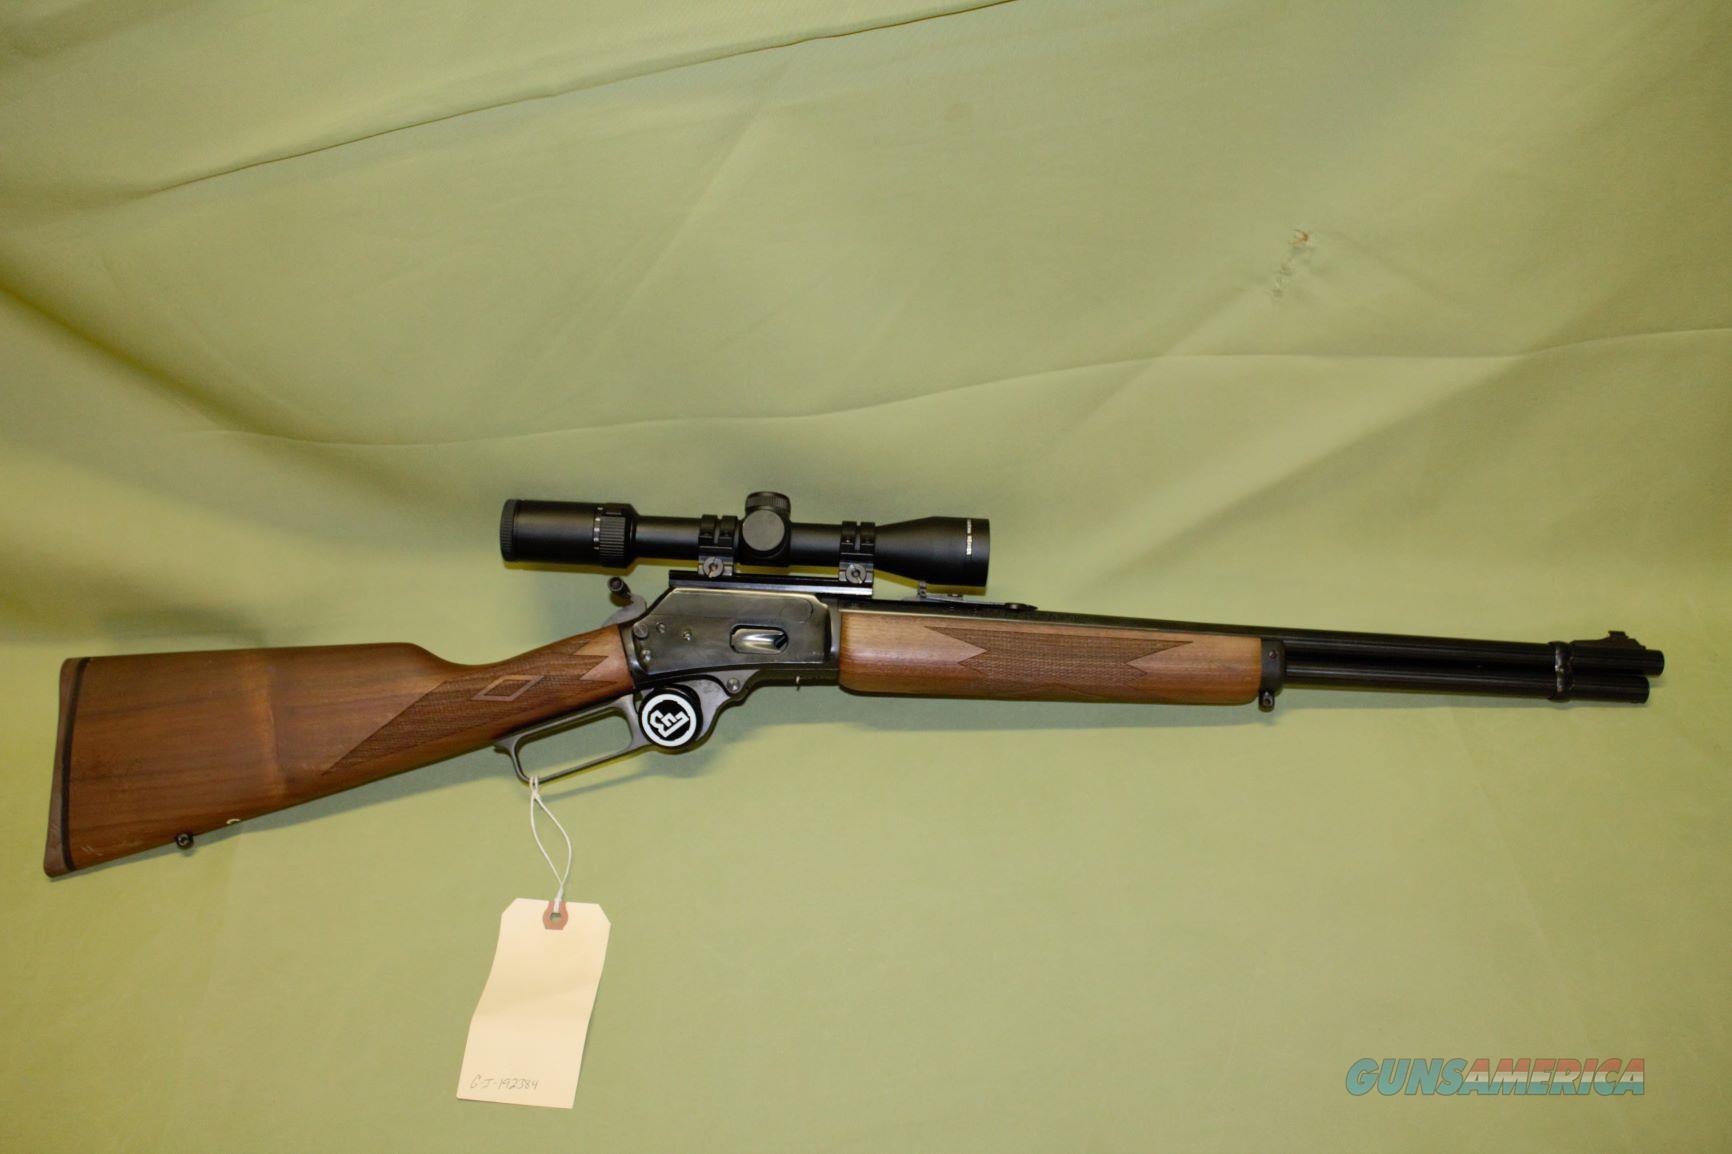 Marlin 1894 44Mag/44Spl  Guns > Rifles > Marlin Rifles > Modern > Lever Action